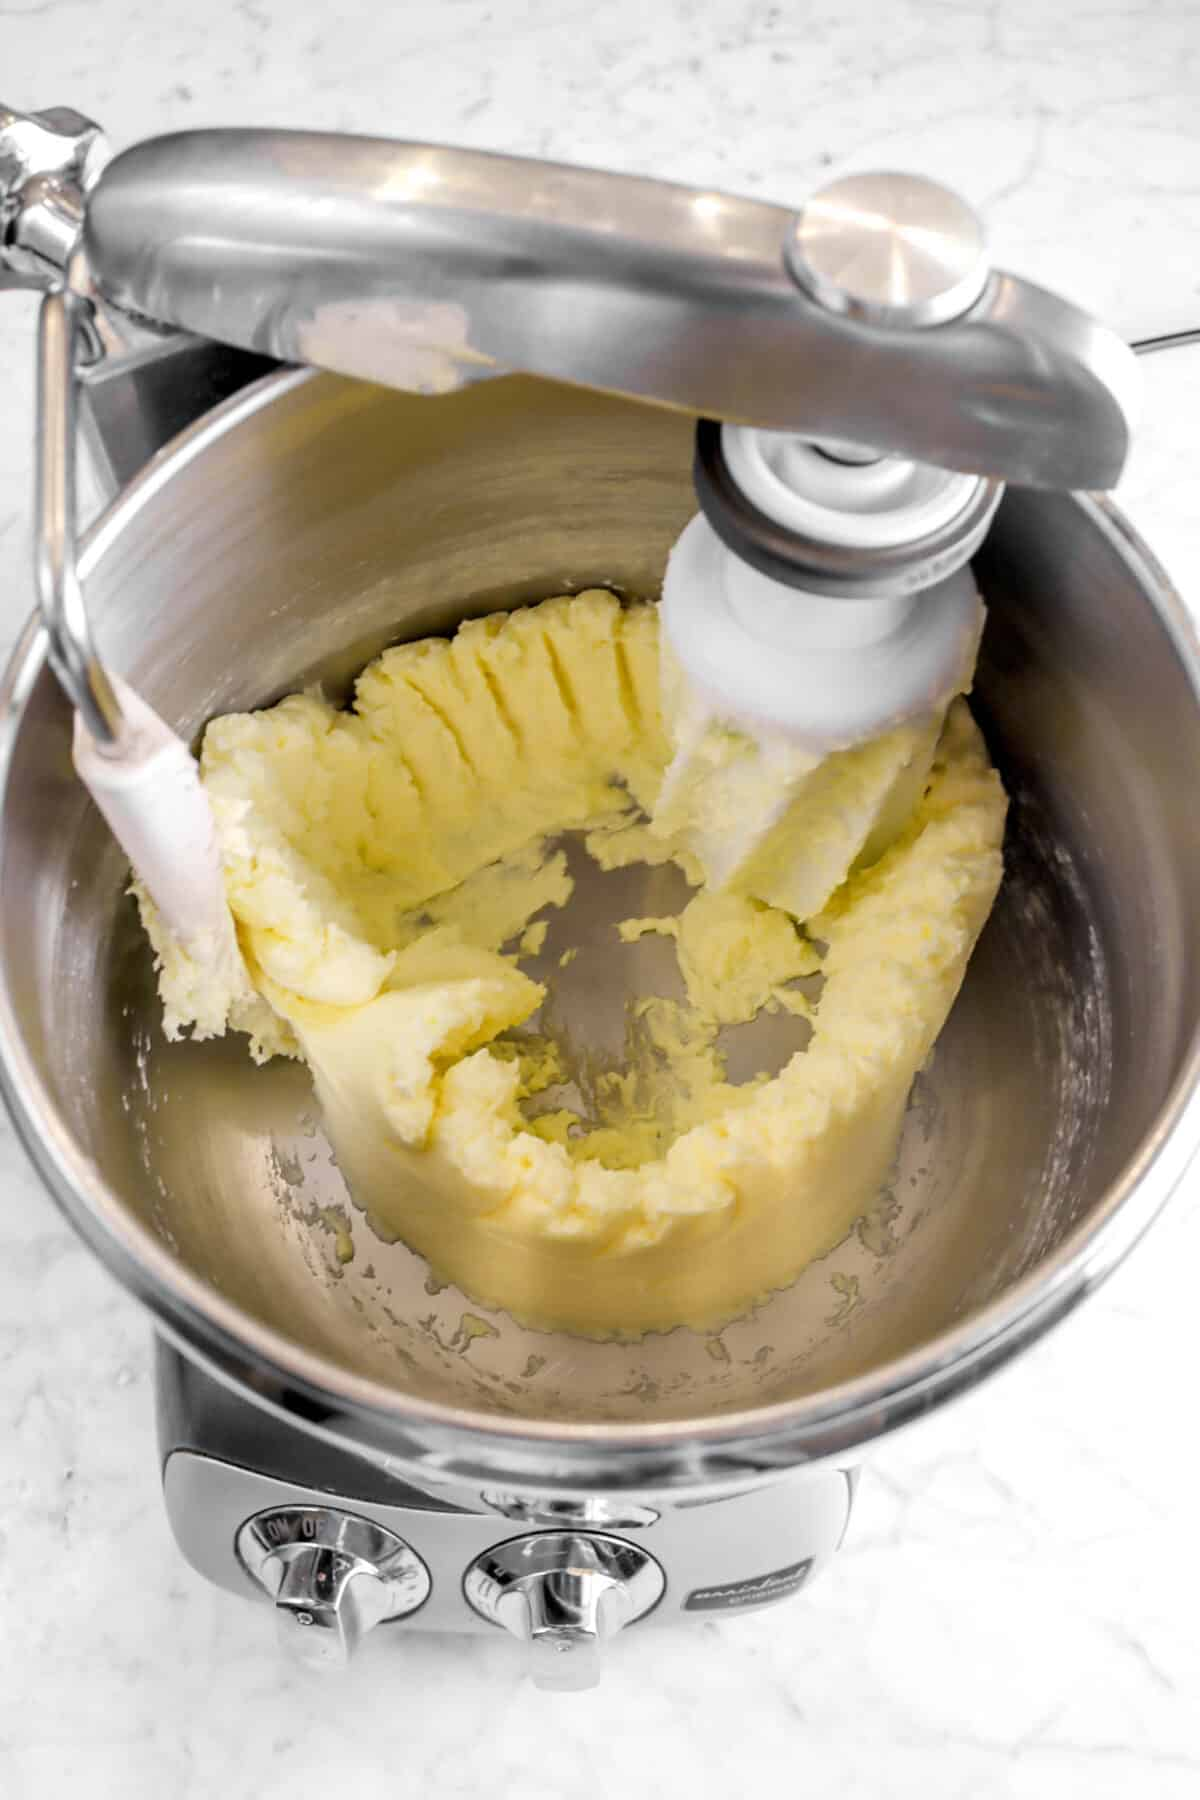 lemon stirred into butter mixture